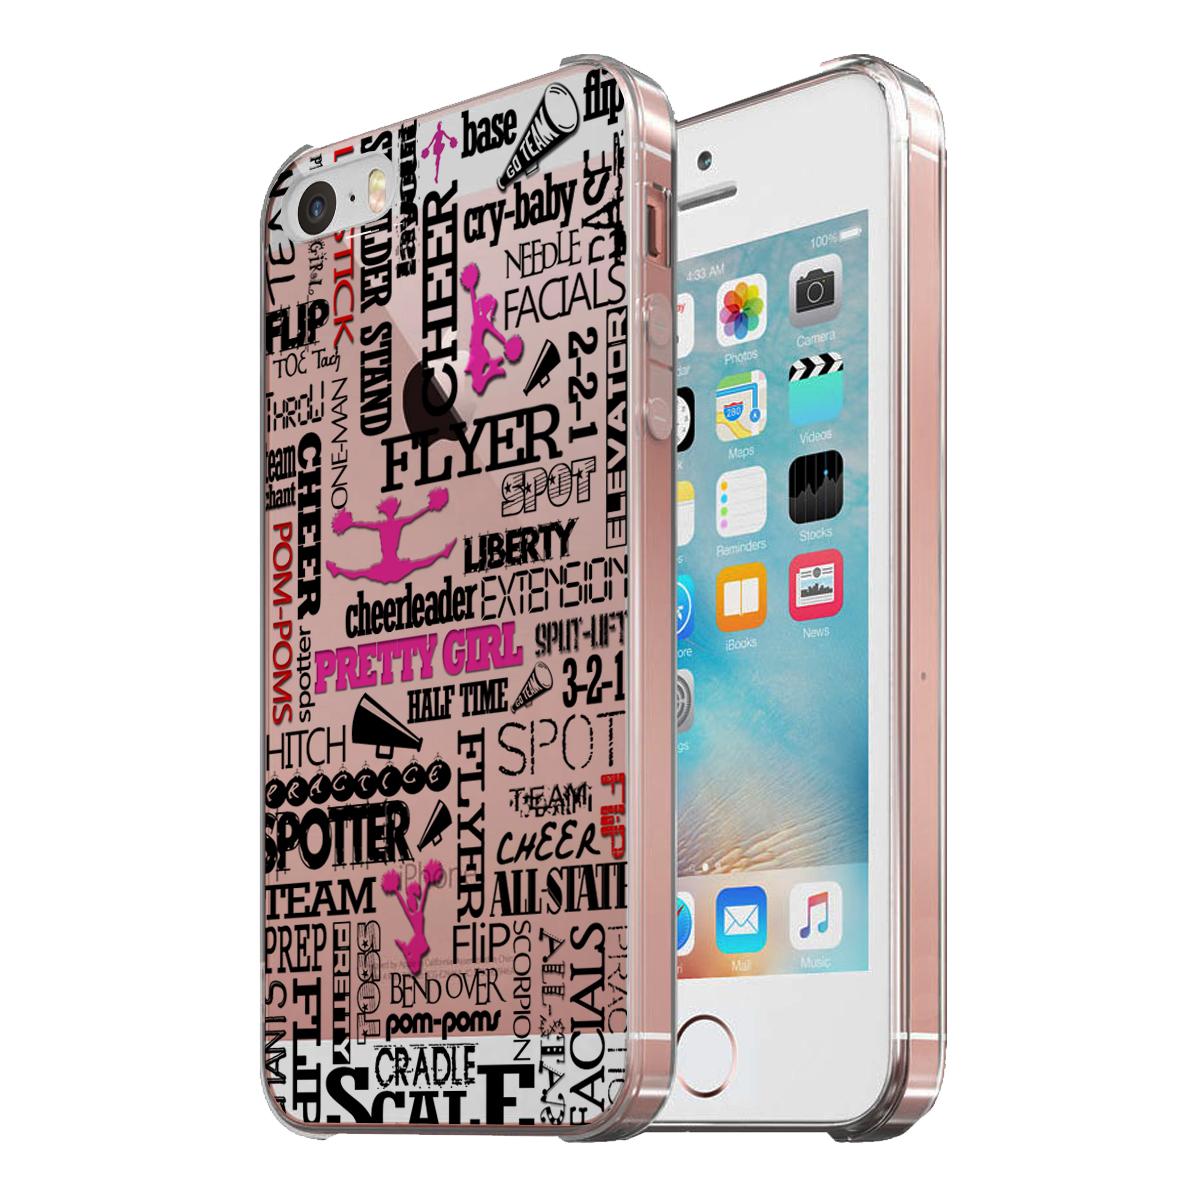 KuzmarK Clear Cover Case fits iPhone SE & iPhone 5 - Cheerleader Cheer